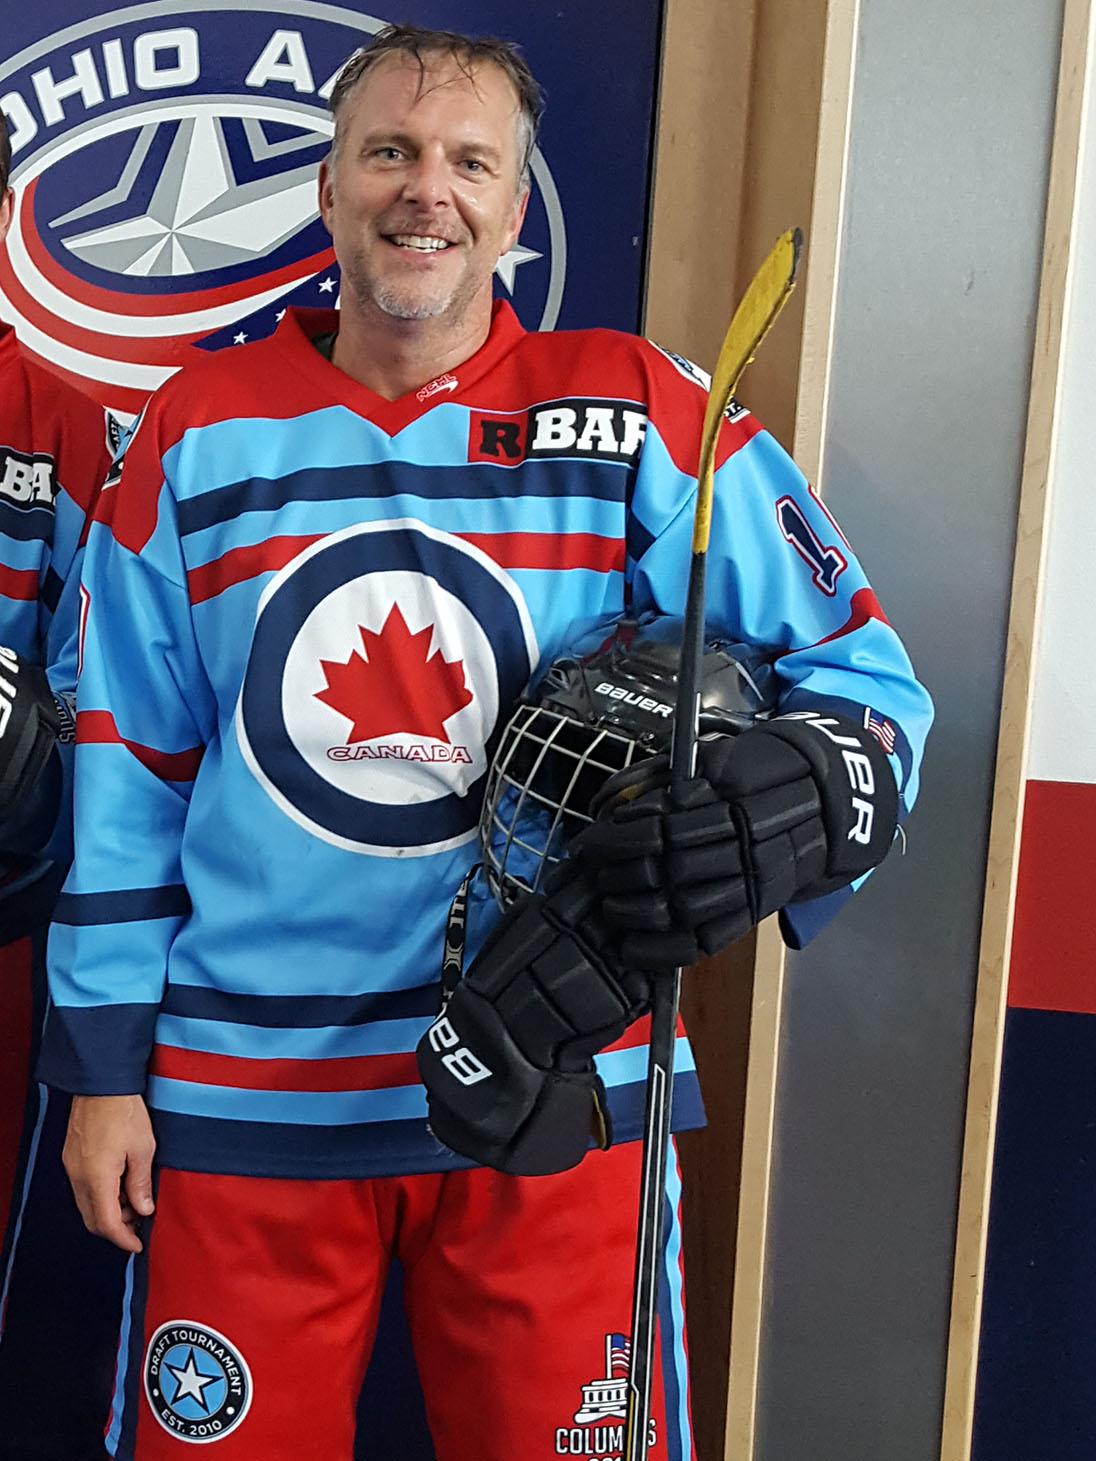 Brad playing hockey